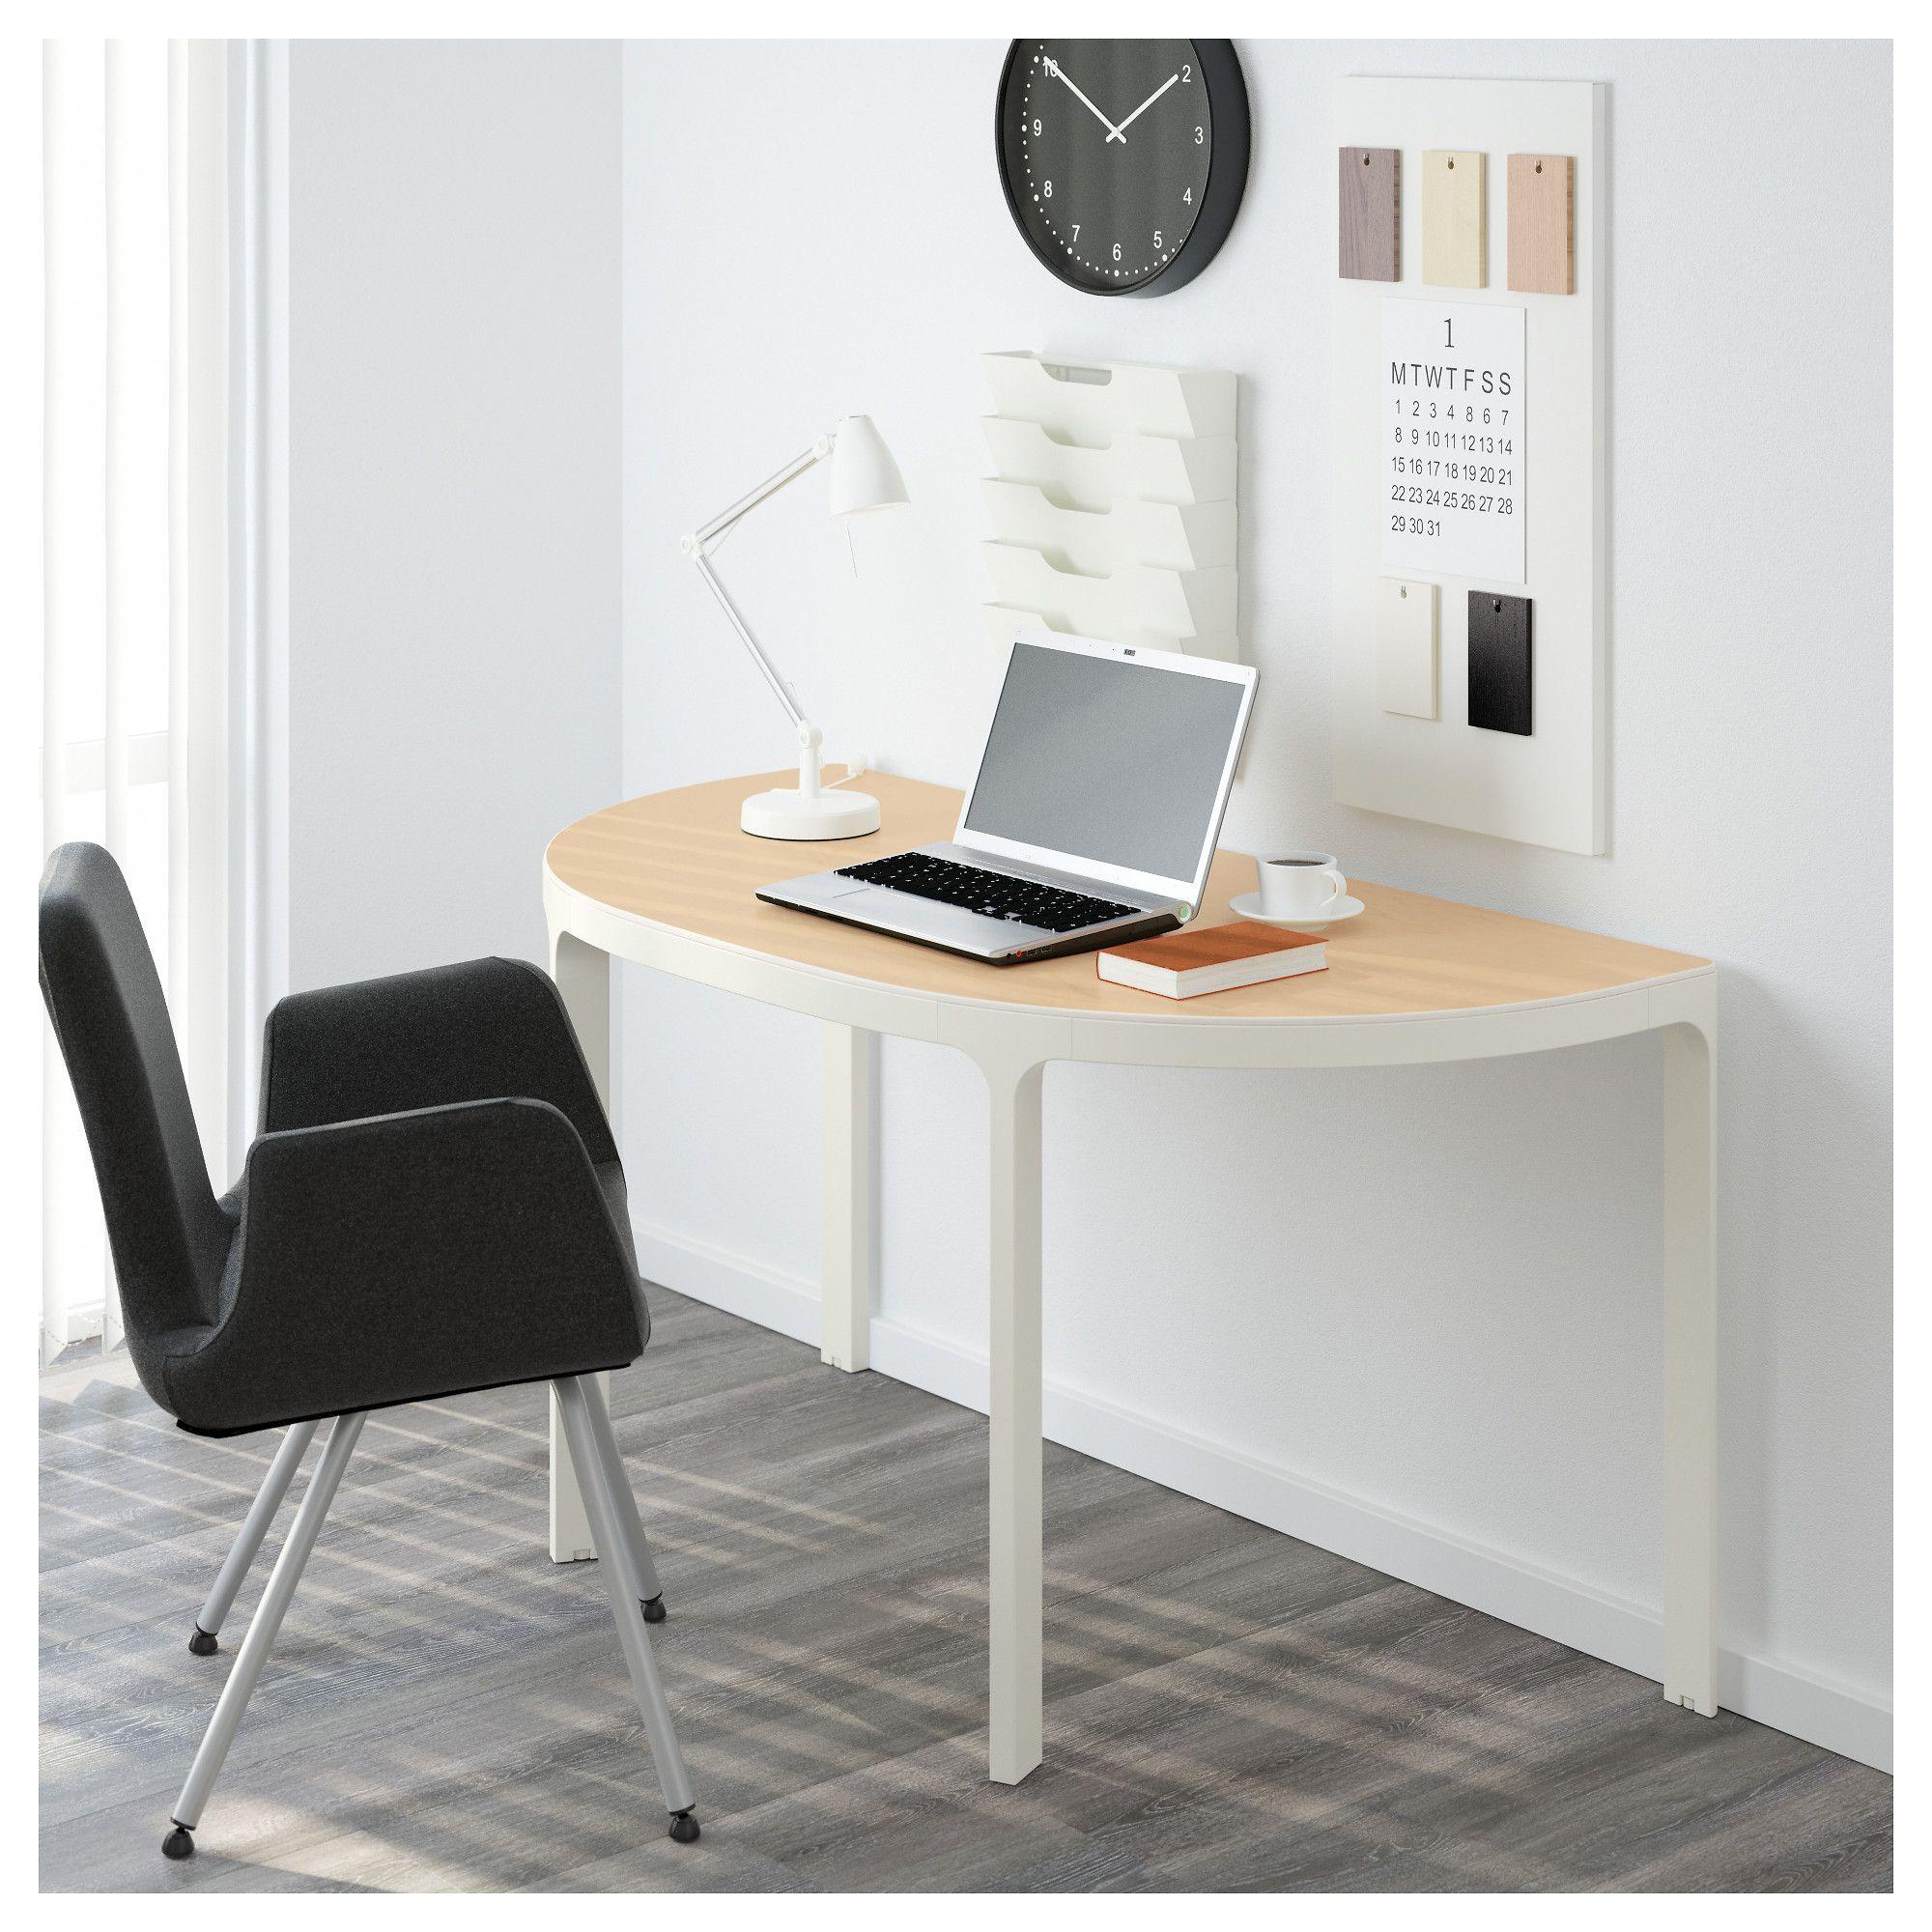 Attirant IKEA   BEKANT Frame For Half Round Table Top White